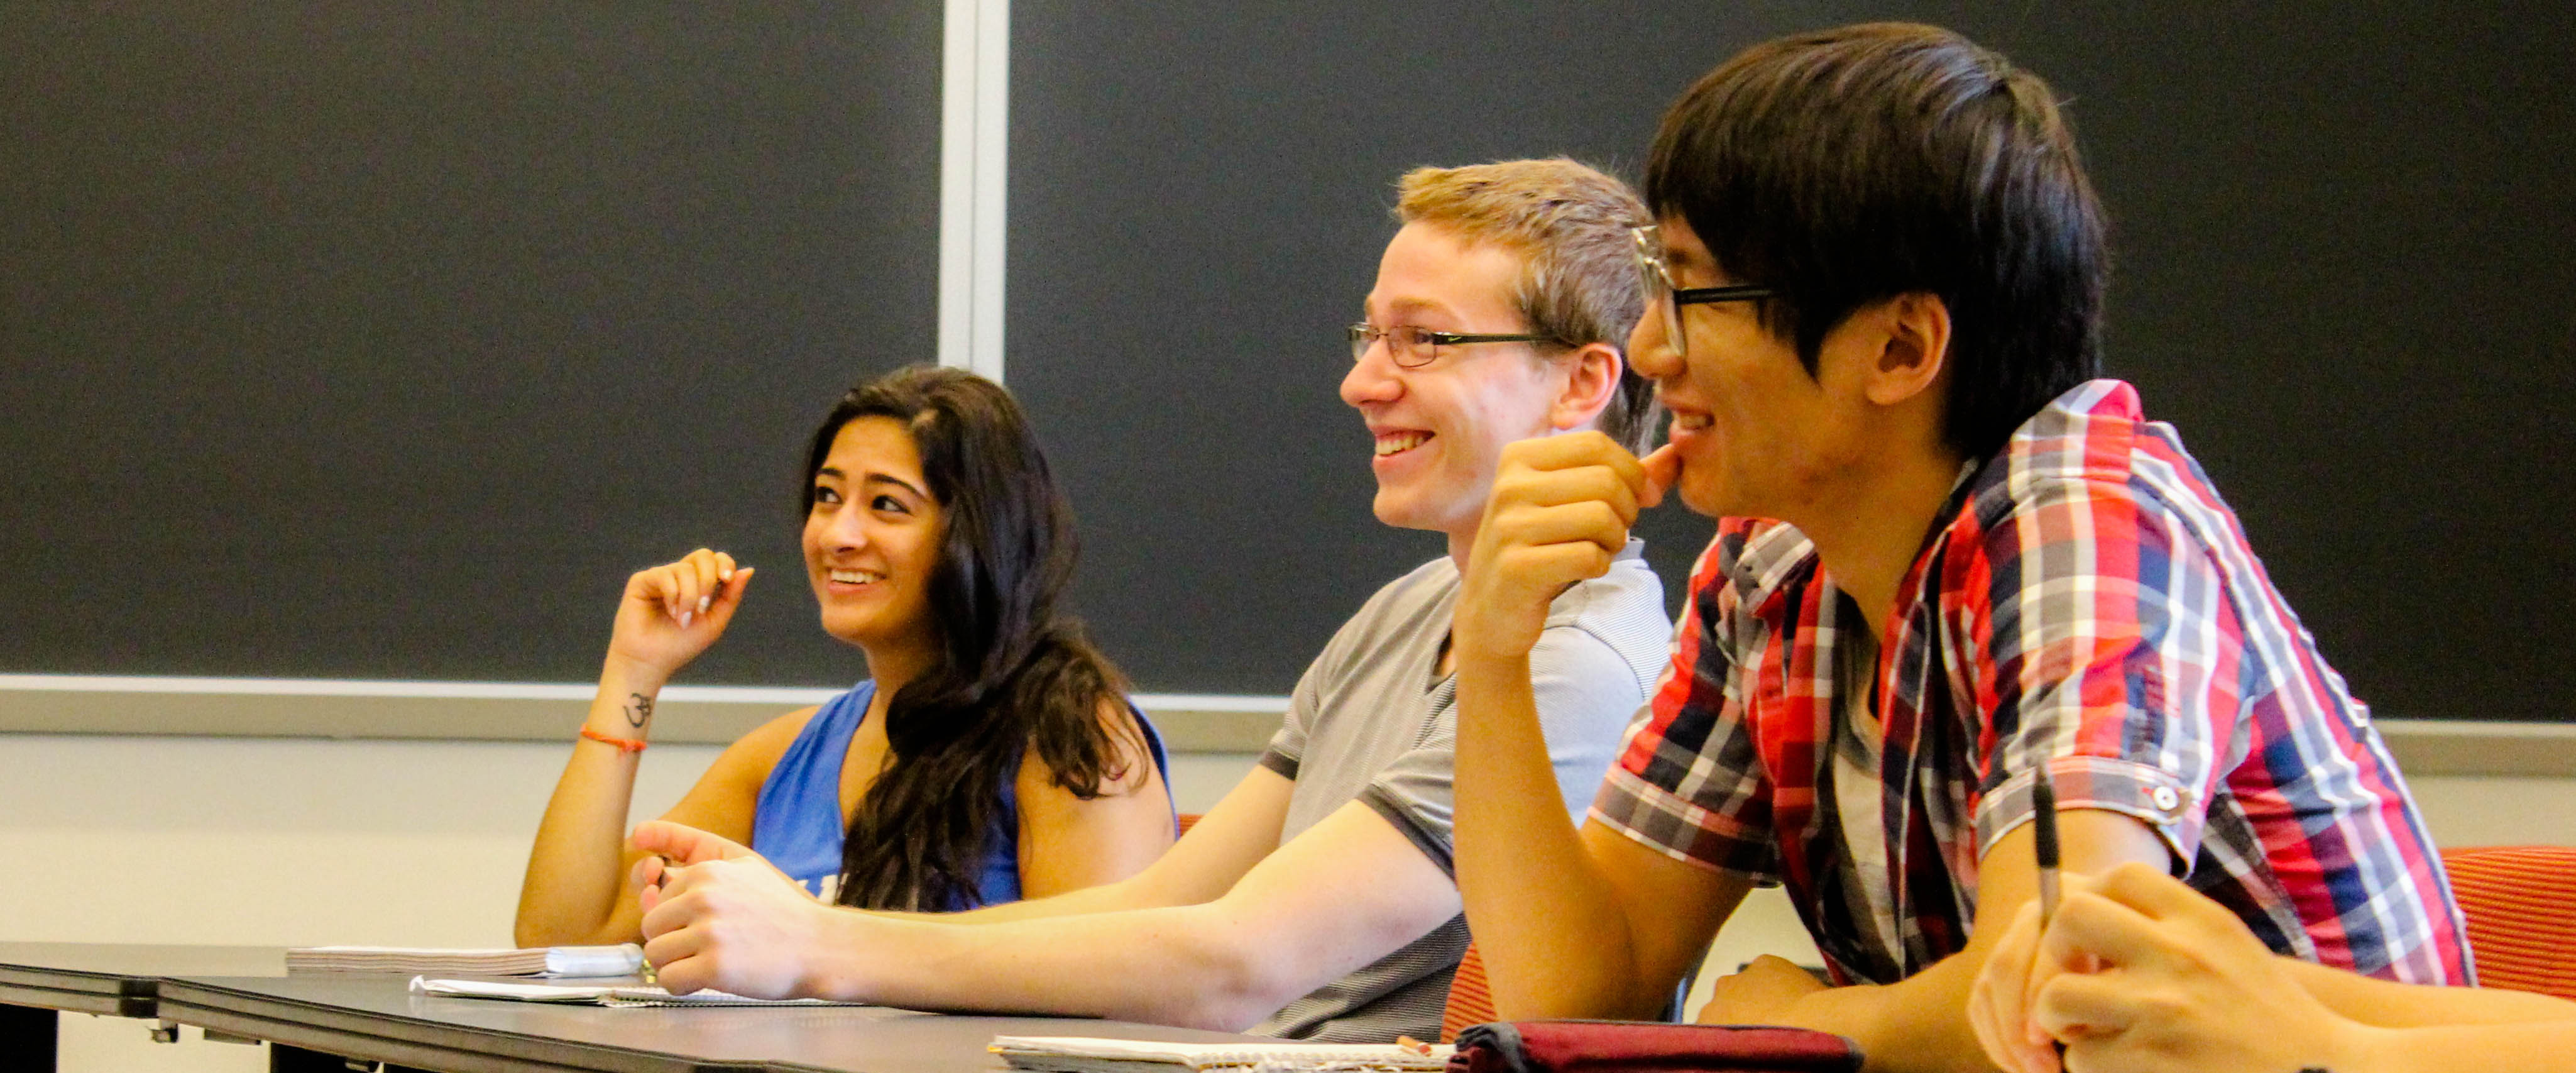 Summer Program - STEM   Johns Hopkins University: Pre-College Summer Programs